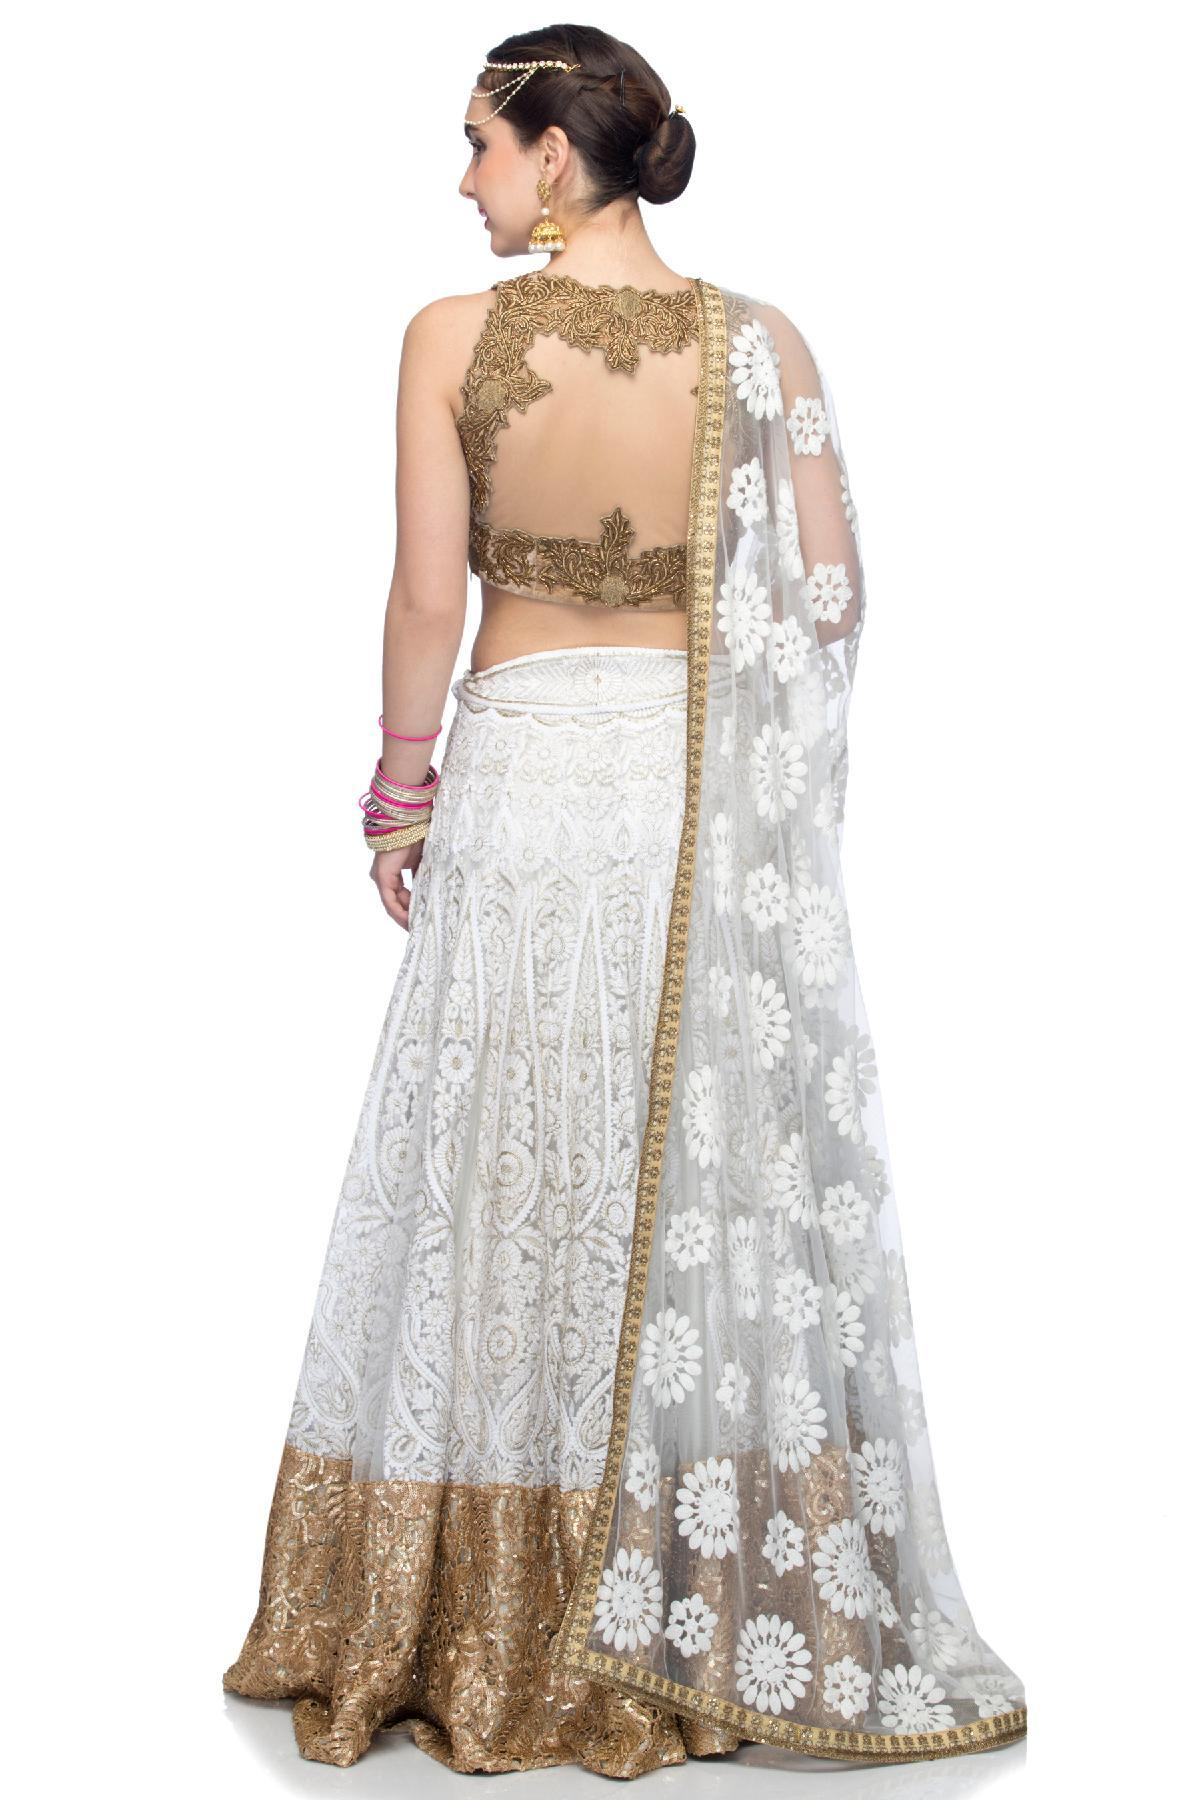 c0148f6aac1fca ... Violet by Preeti Singhal ethnic White Embroidered Lehenga with Golden  Velvet Blouse White & Gold lehenga ...